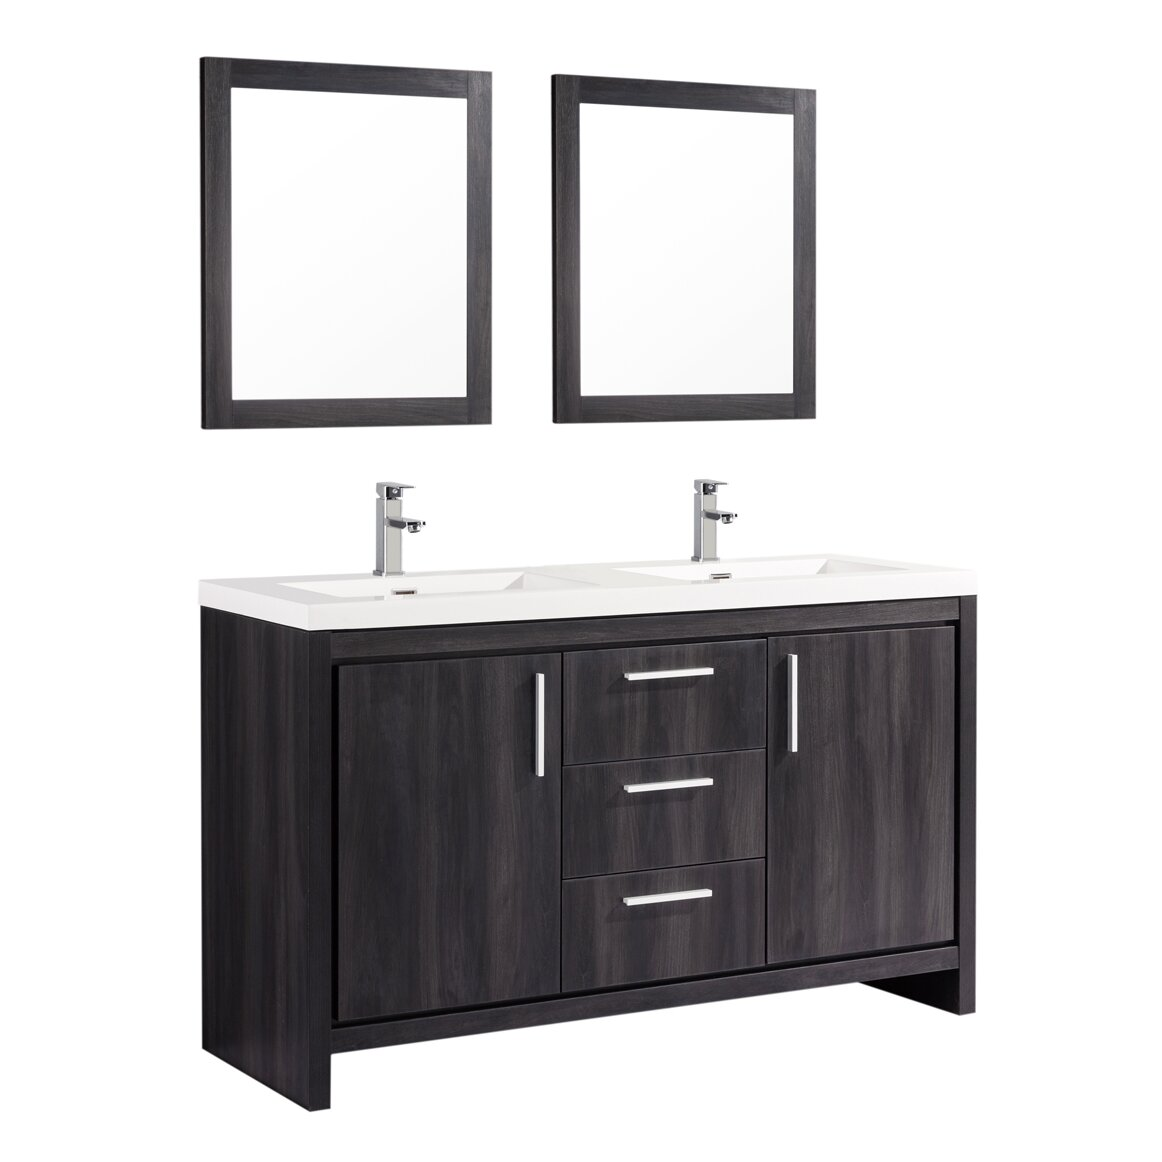 Mtdvanities Miami 59 Double Sink Modern Bathroom Vanity Set With Mirror Reviews